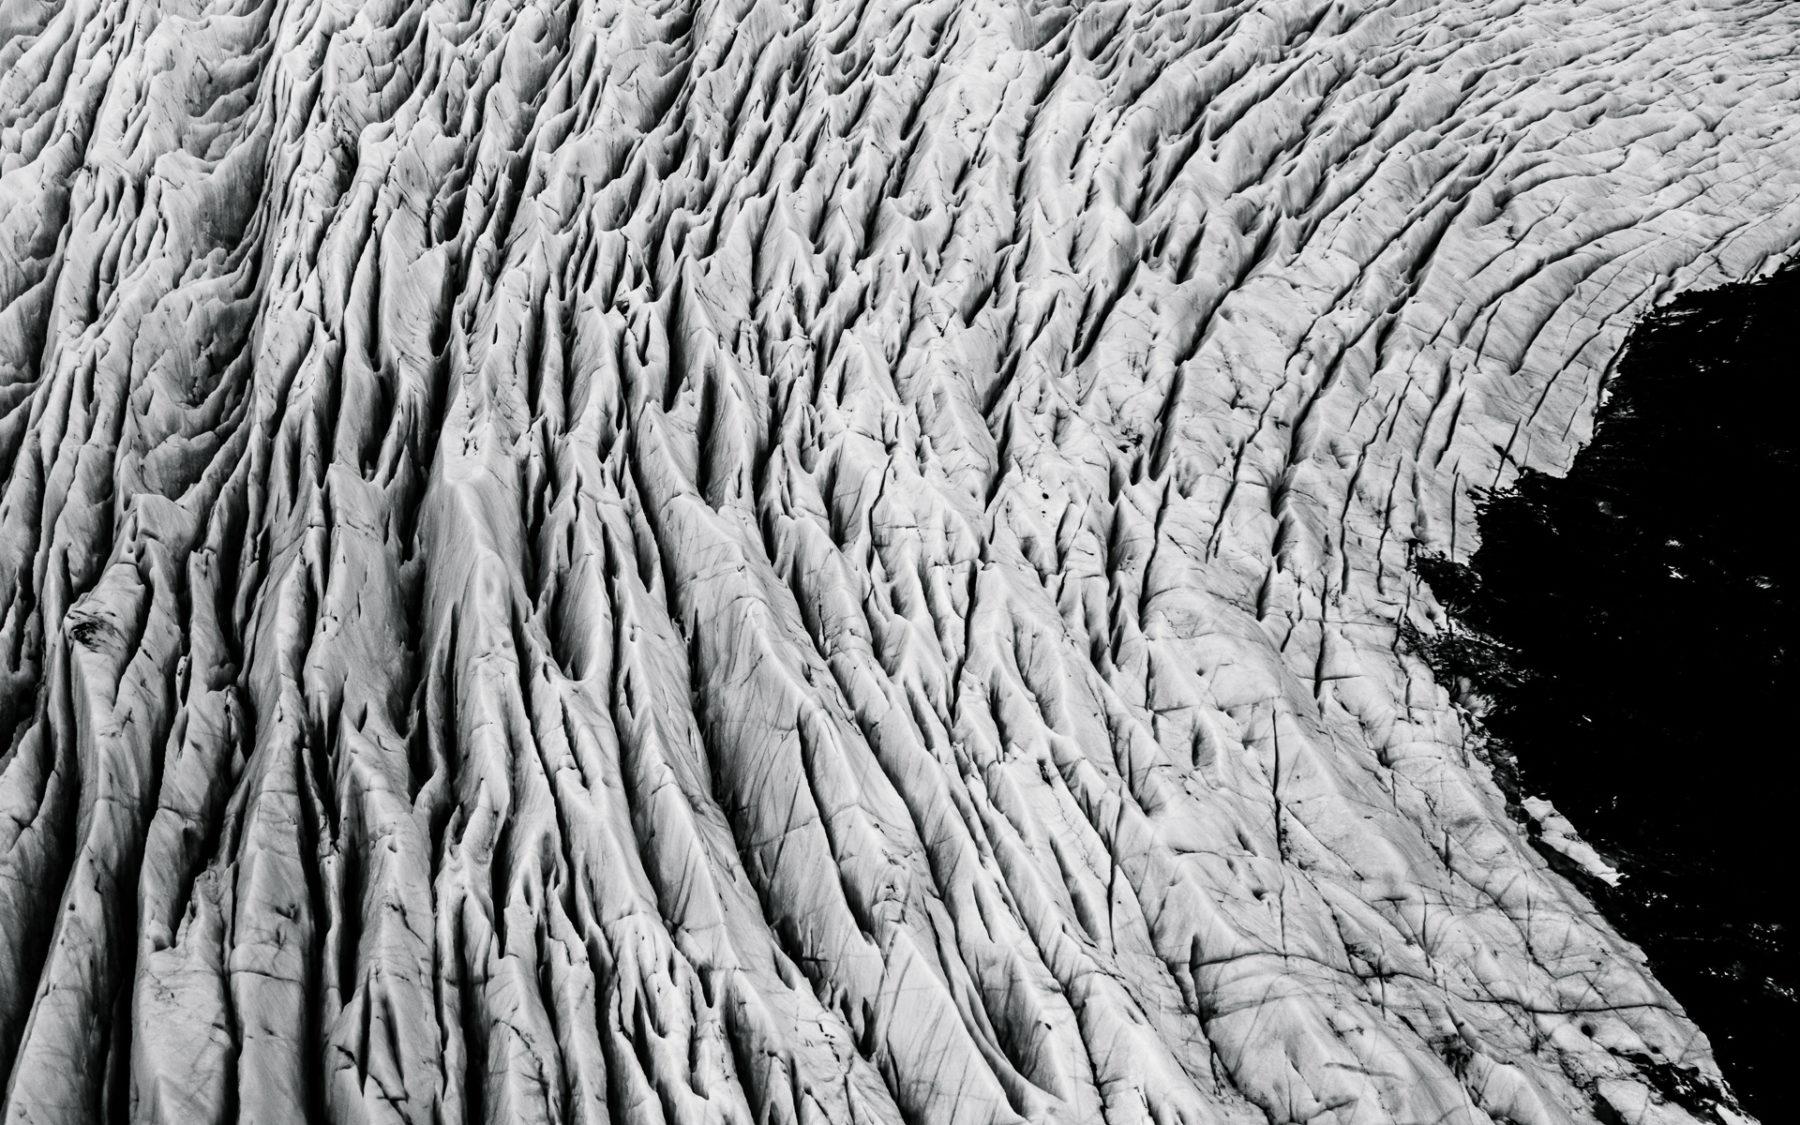 nls 2001 norway iceland portraits of glaciers 13